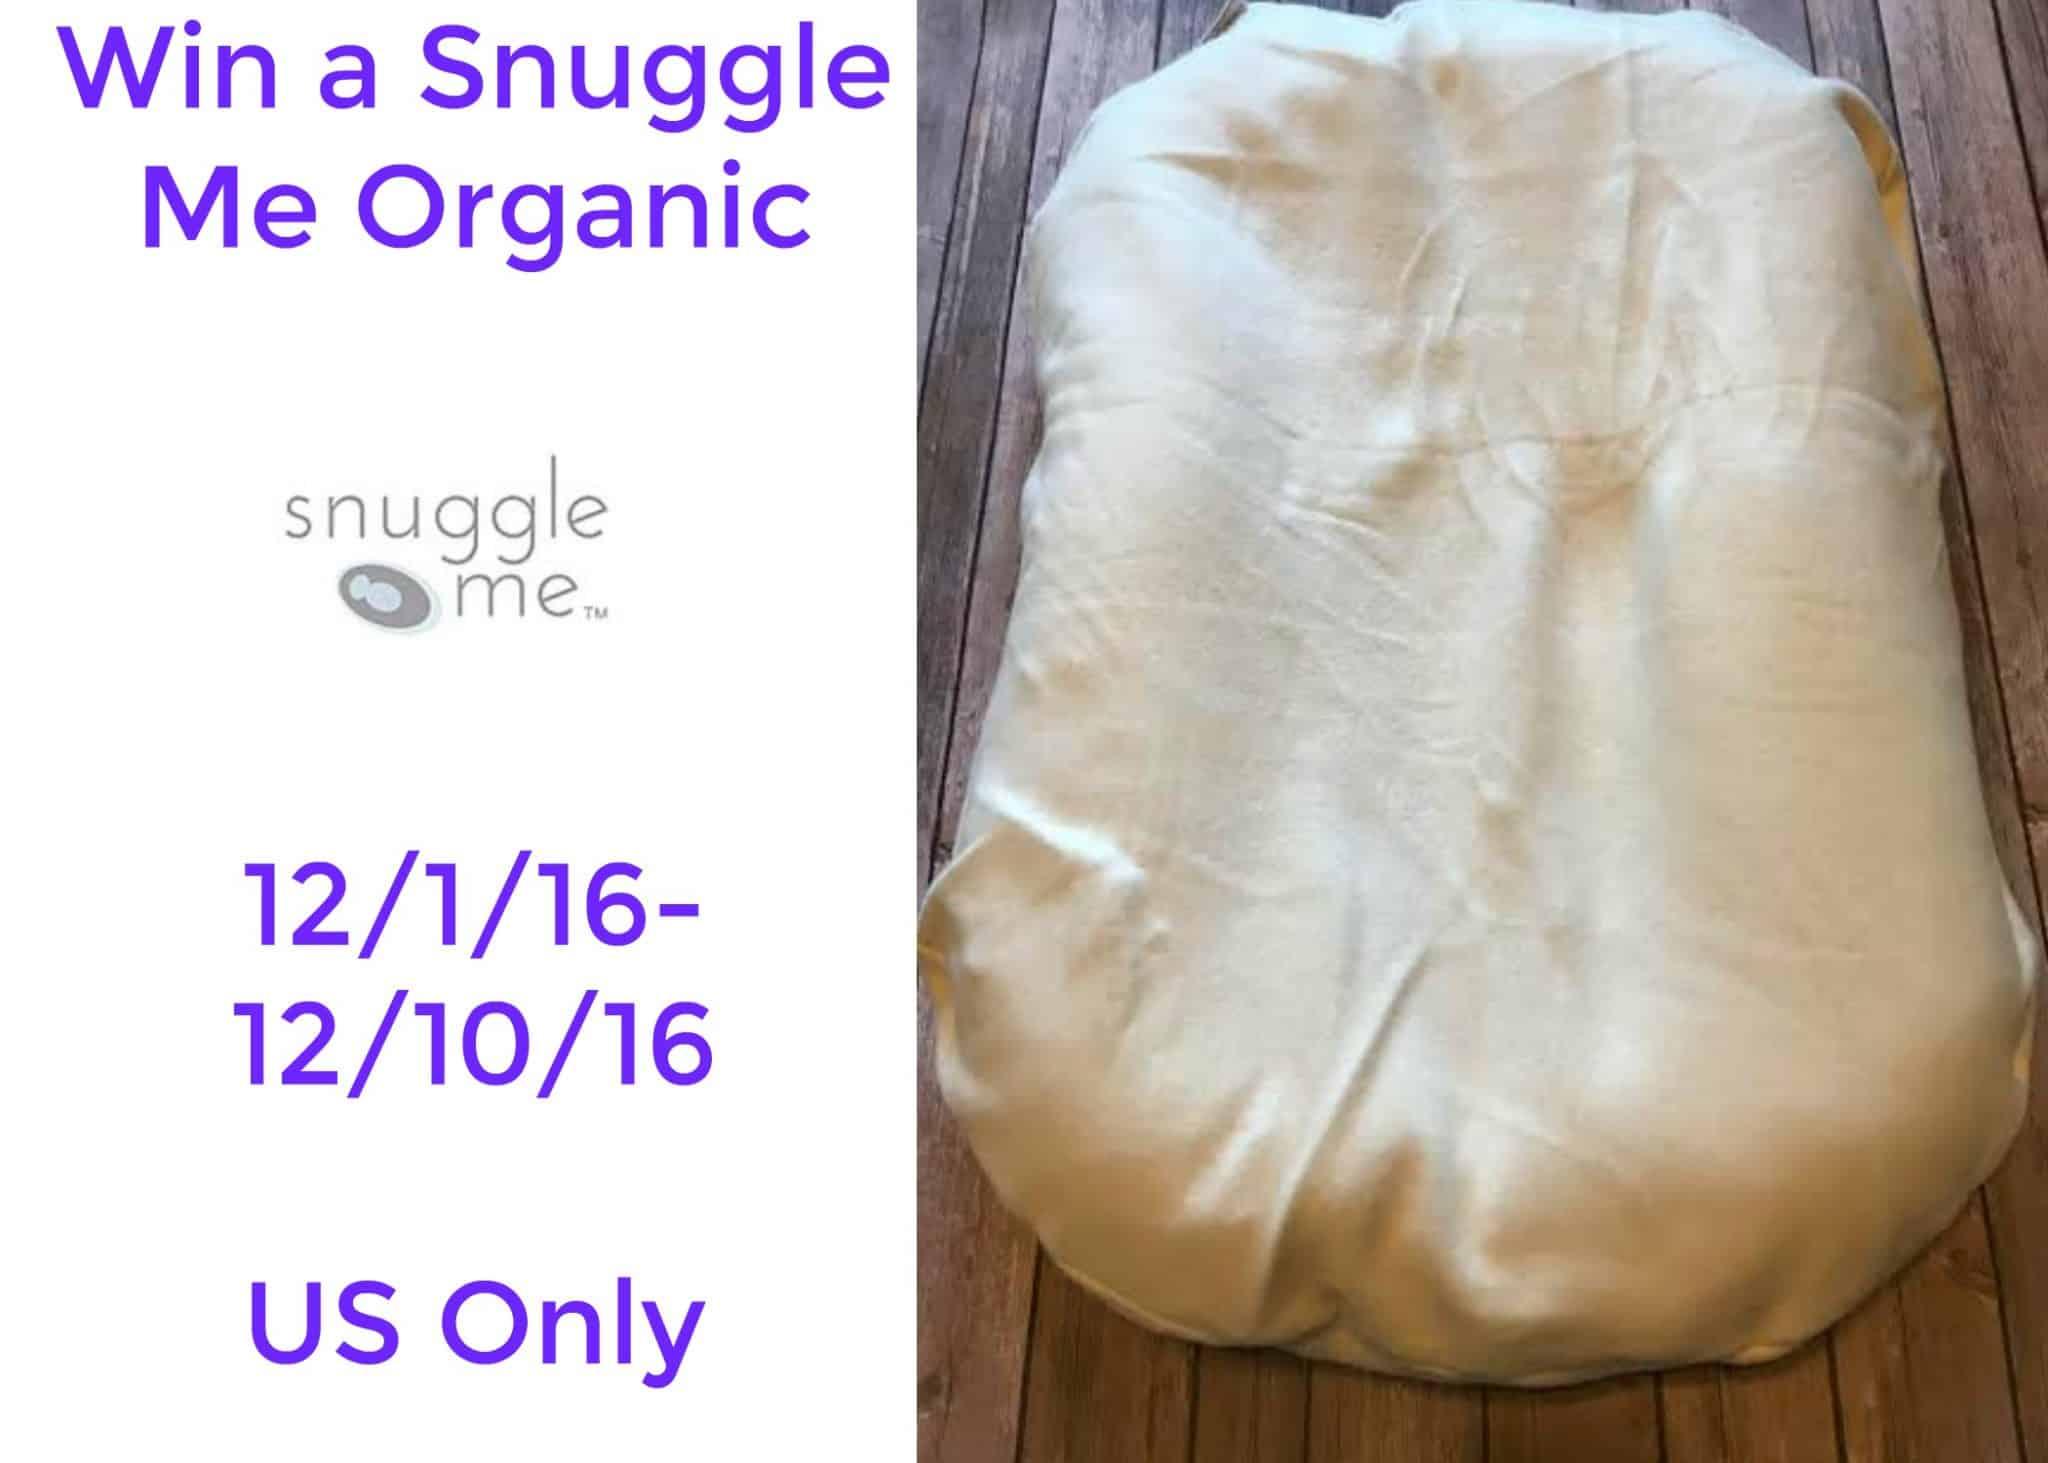 snuggle-me-giveaway